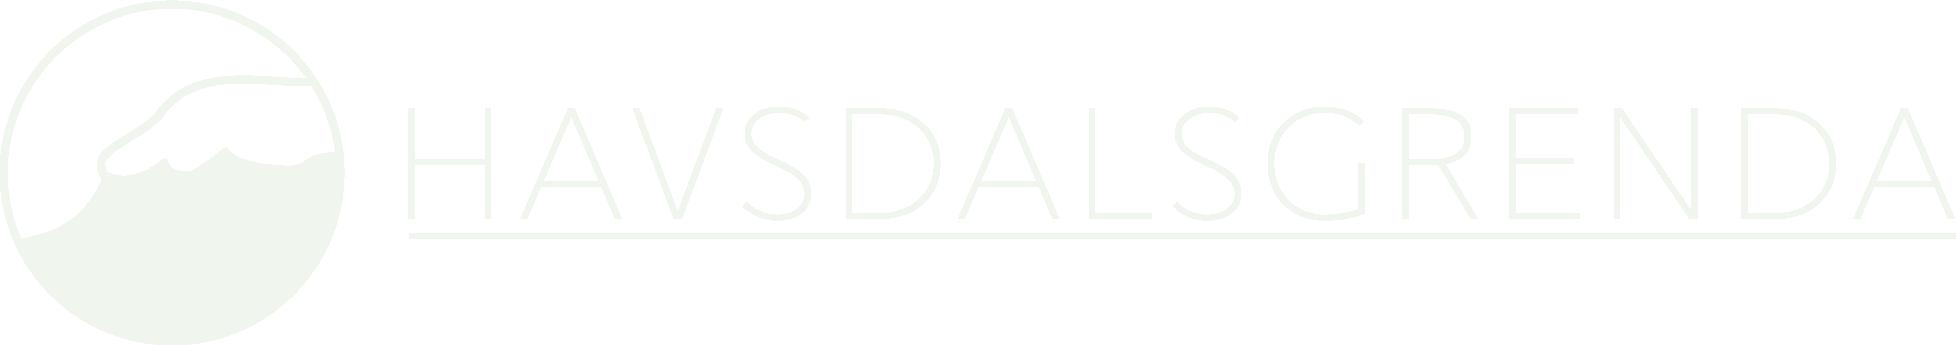 Havsdalsgrenda logo